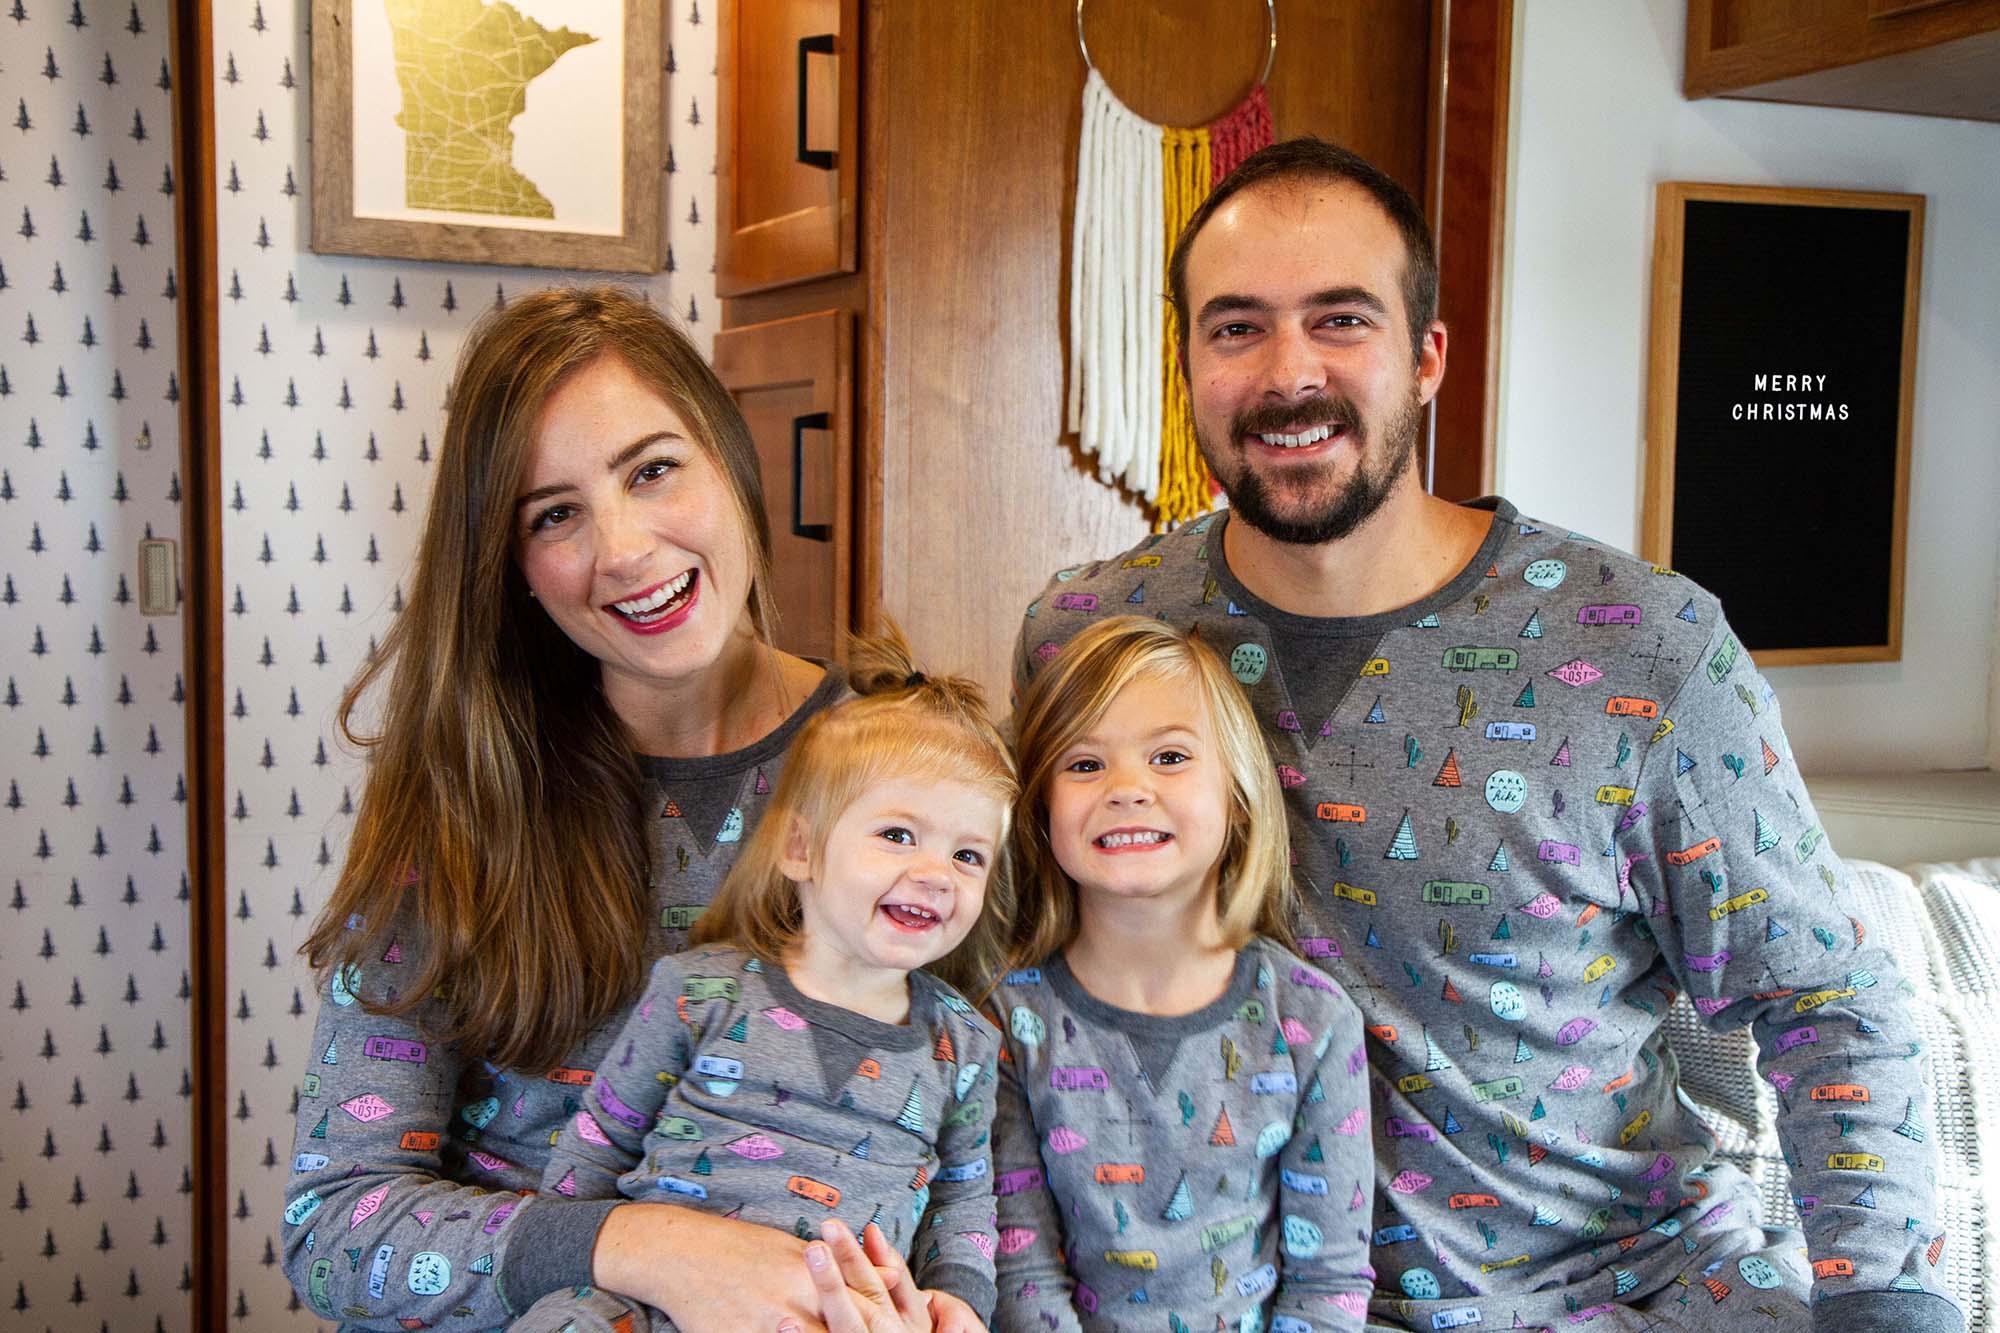 Why We Stopped Our Full-Time Travels. @outofboundaries #outofboundaries #fulltimetravel #familytravel #fulltimefamily #RVlife